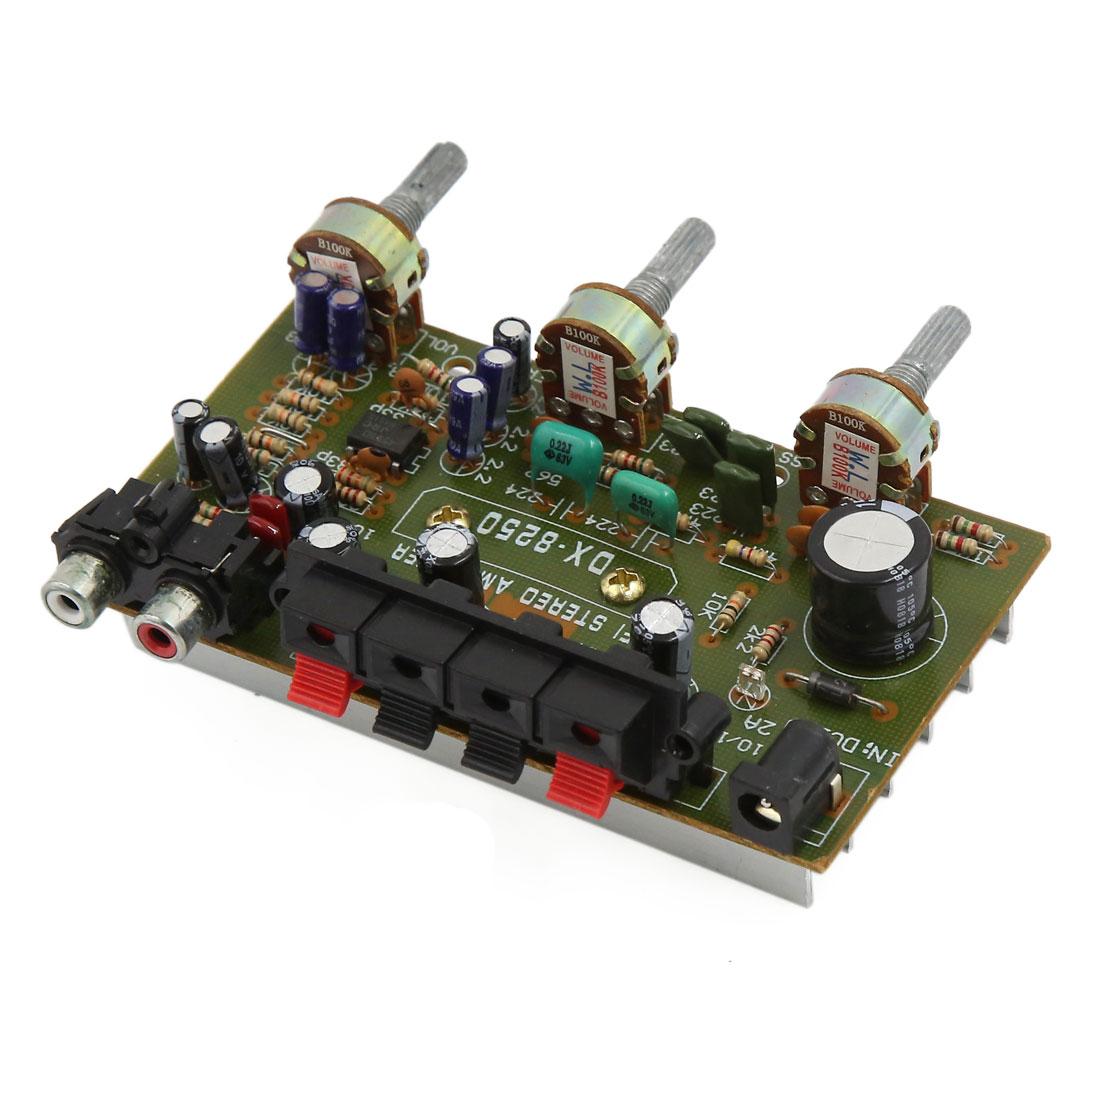 DC12V LFE Subwoofer Audio Hi-Fi 4 Channel Car Boat Stereo Power Amplifier Board